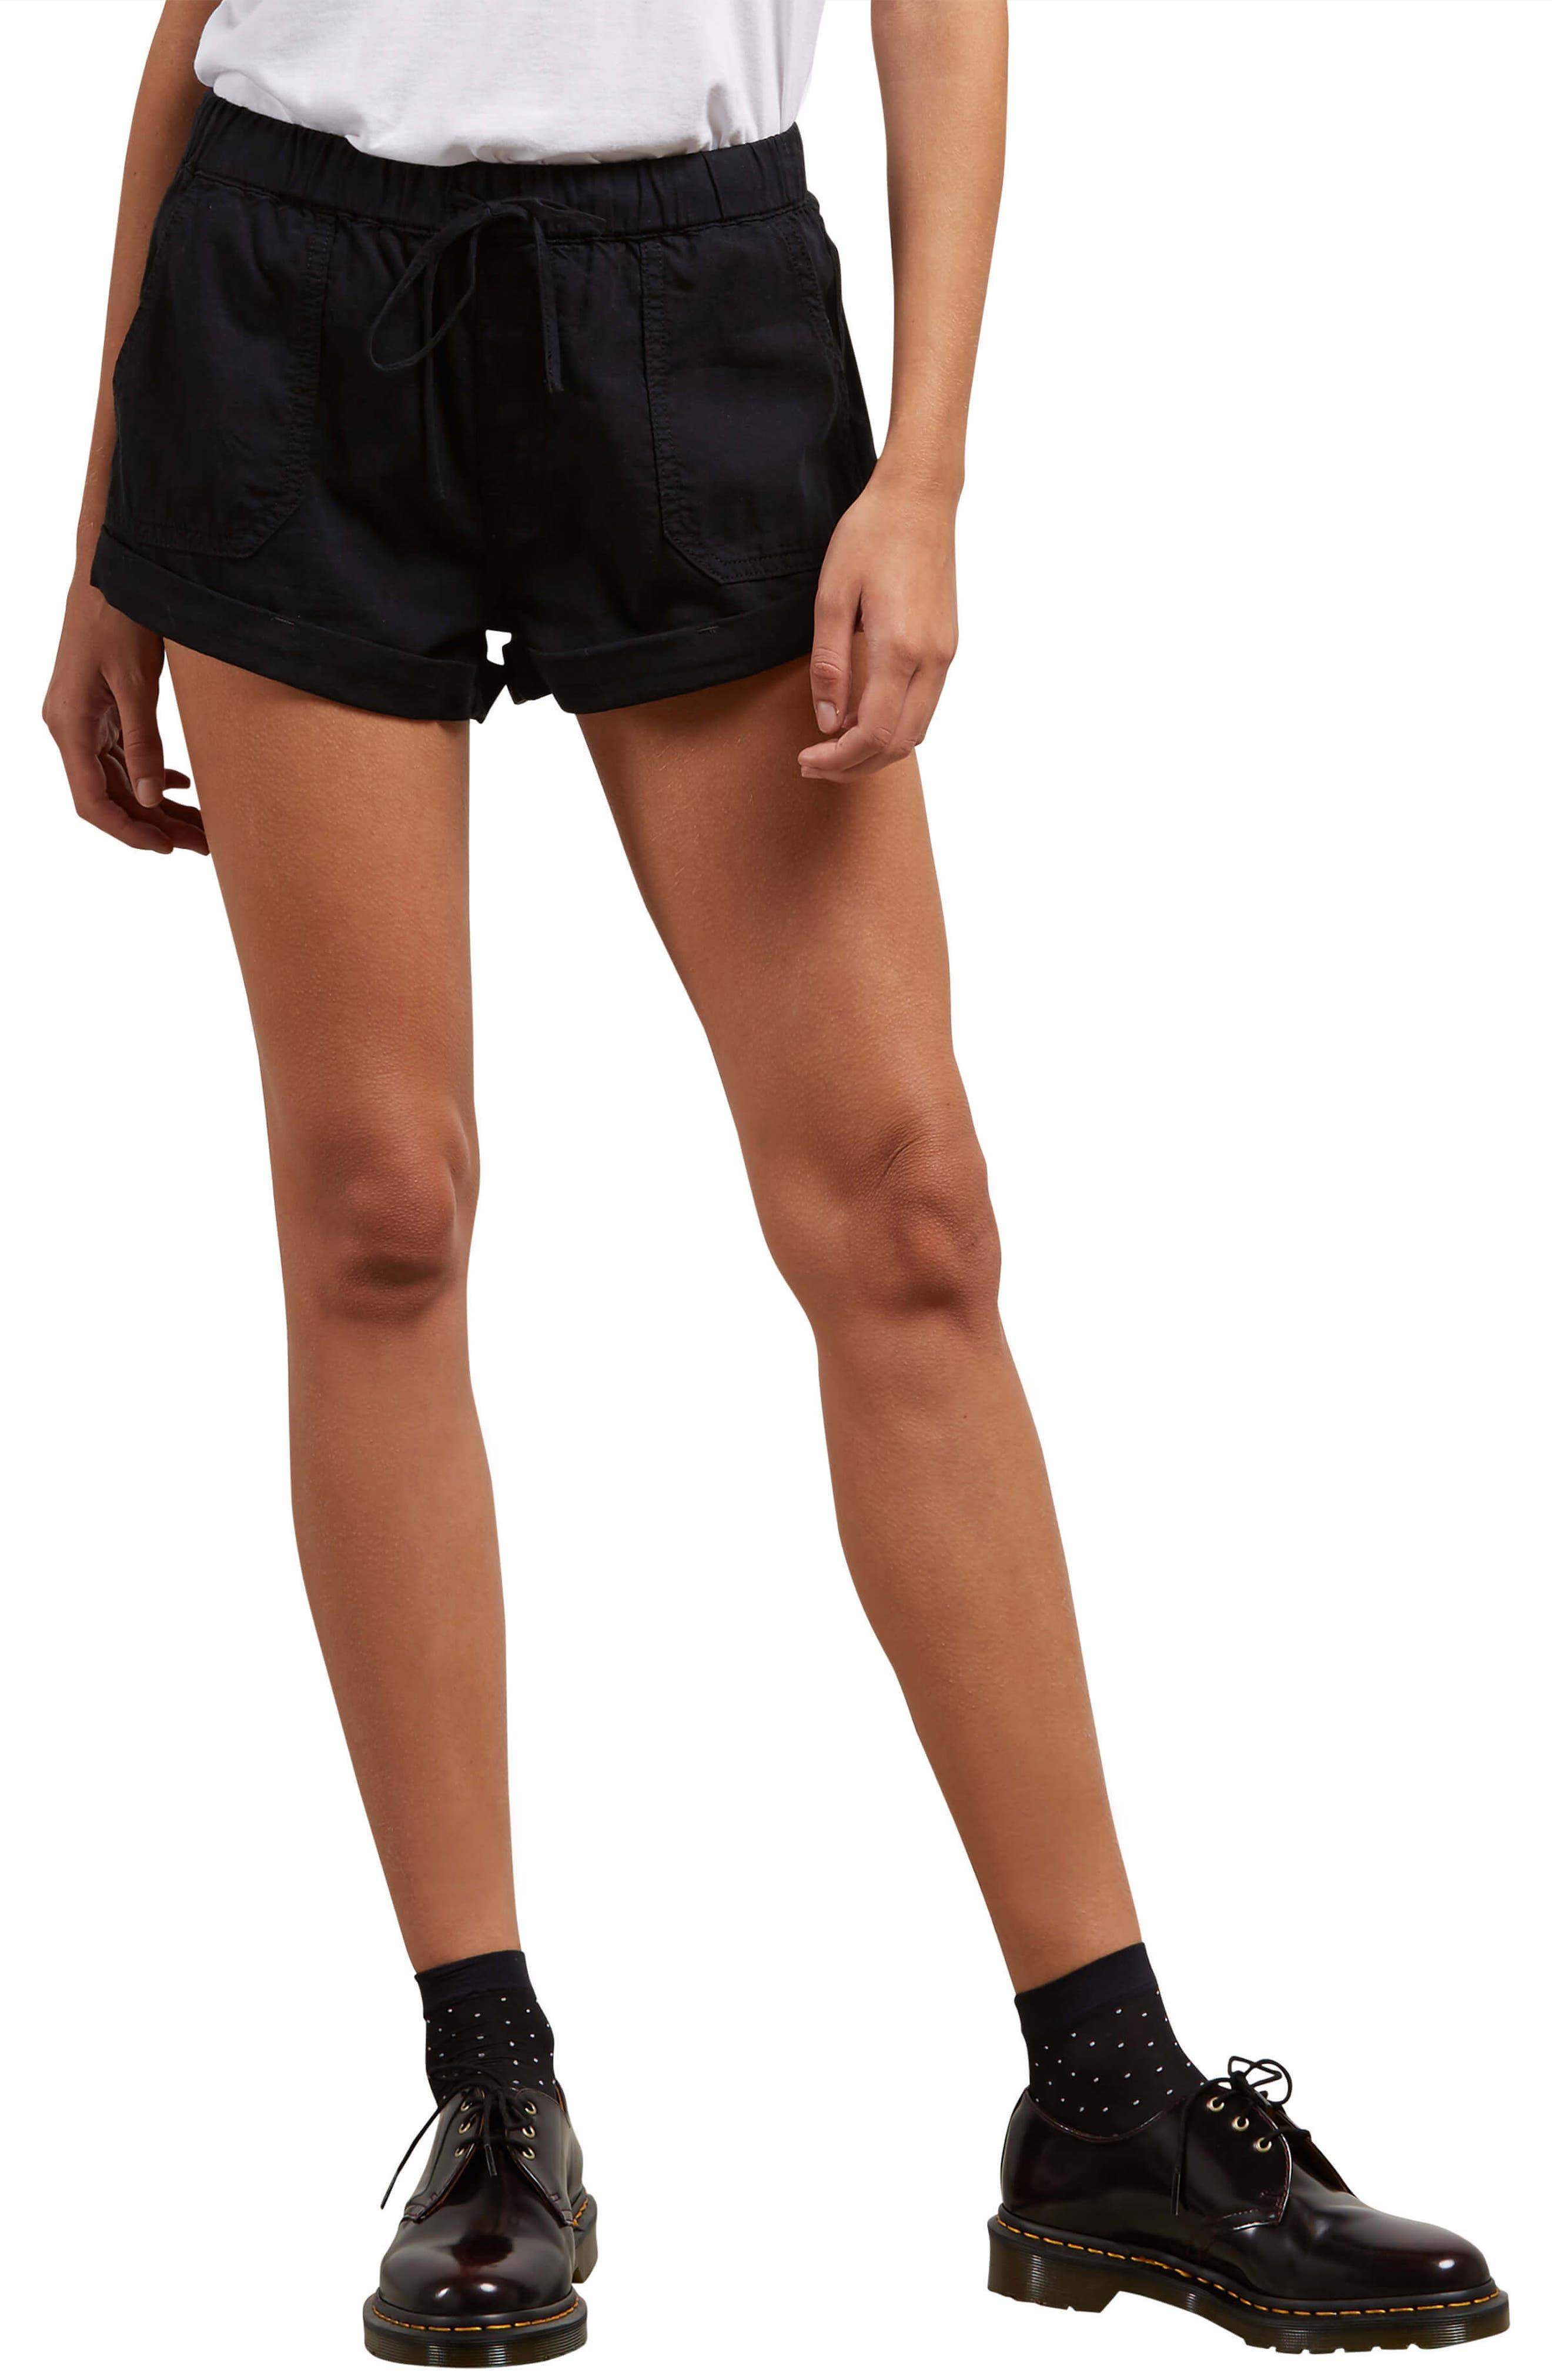 Sunday Strut Shorts,                             Main thumbnail 1, color,                             Black